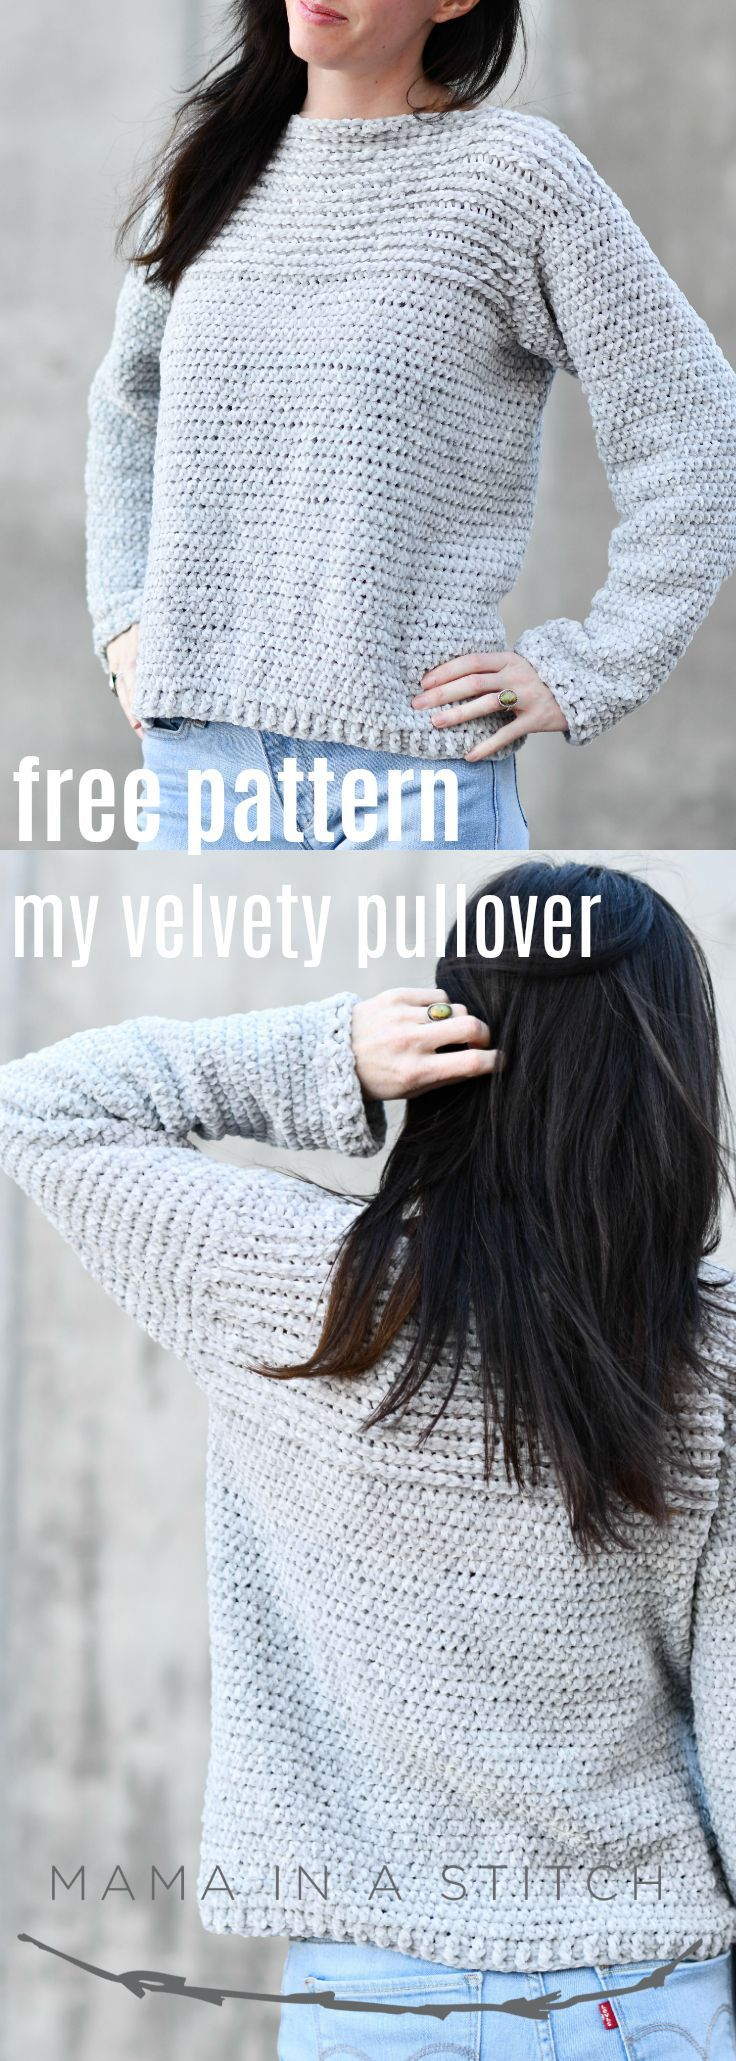 My Velvety Pullover Crochet Pattern #sweatercrochetpattern